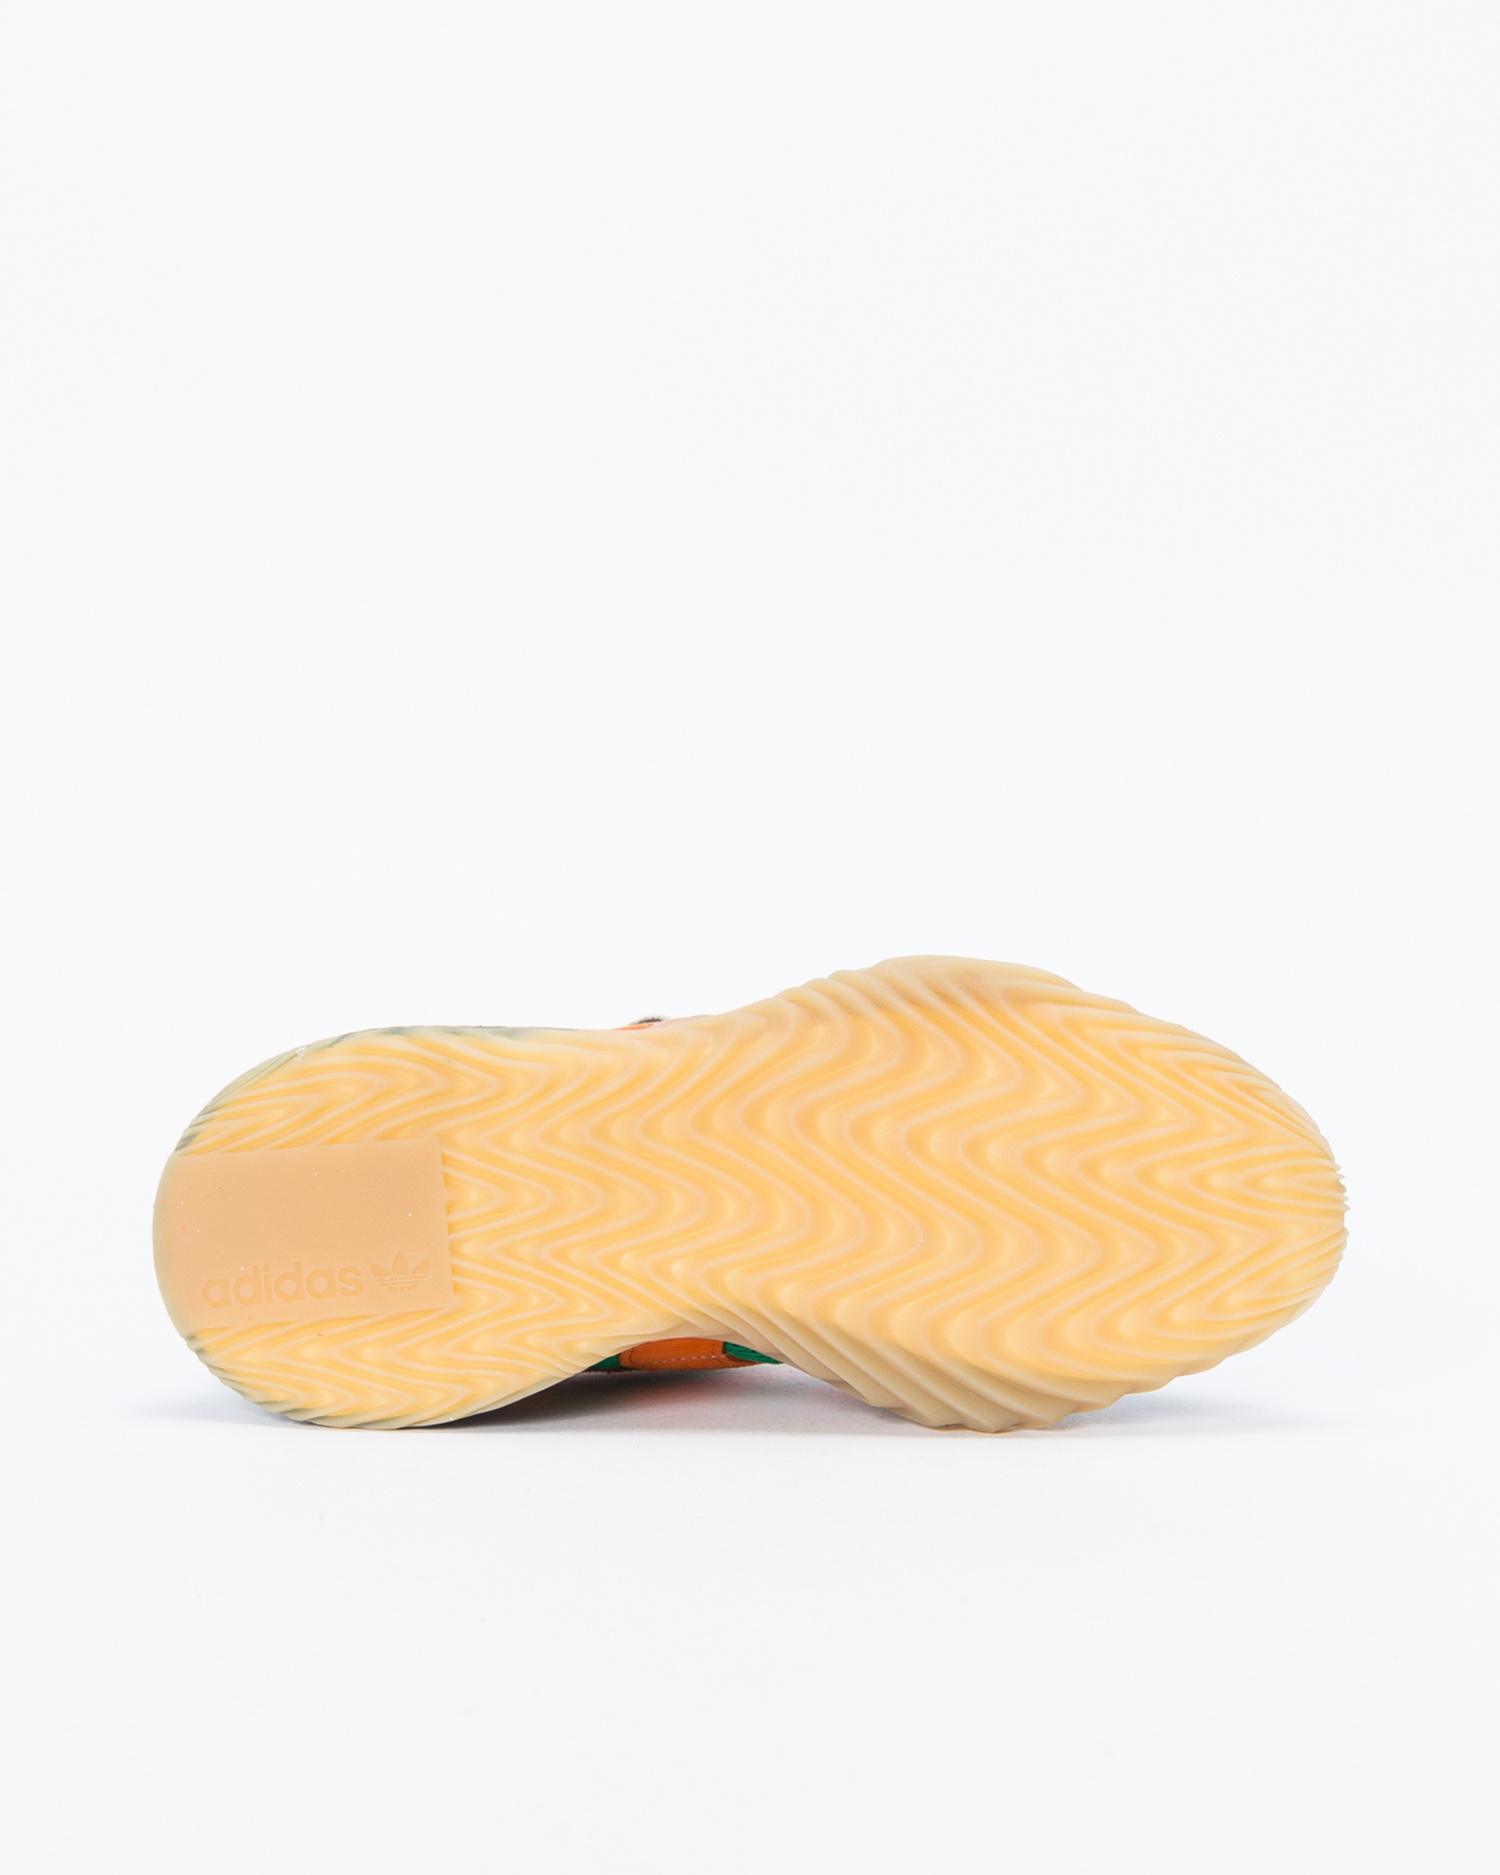 Adidas x SVD Sobakov Boost Core Black/Multi-Color/Gum